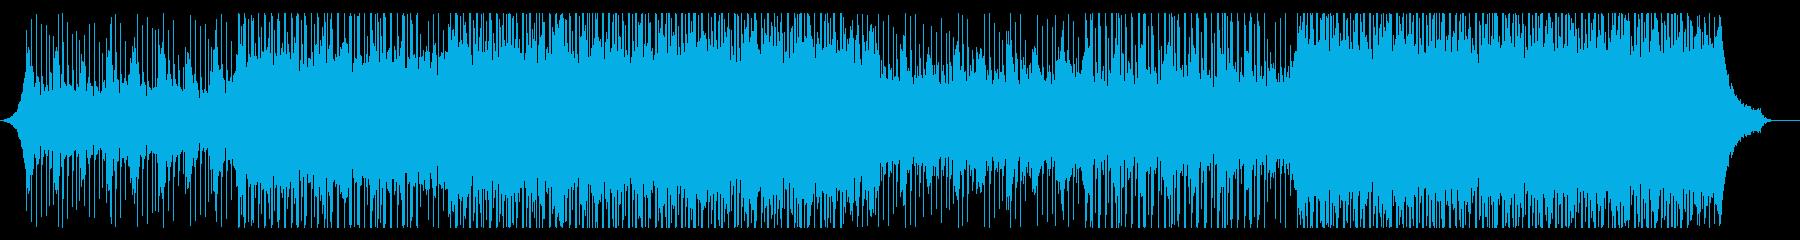 Creative's reproduced waveform